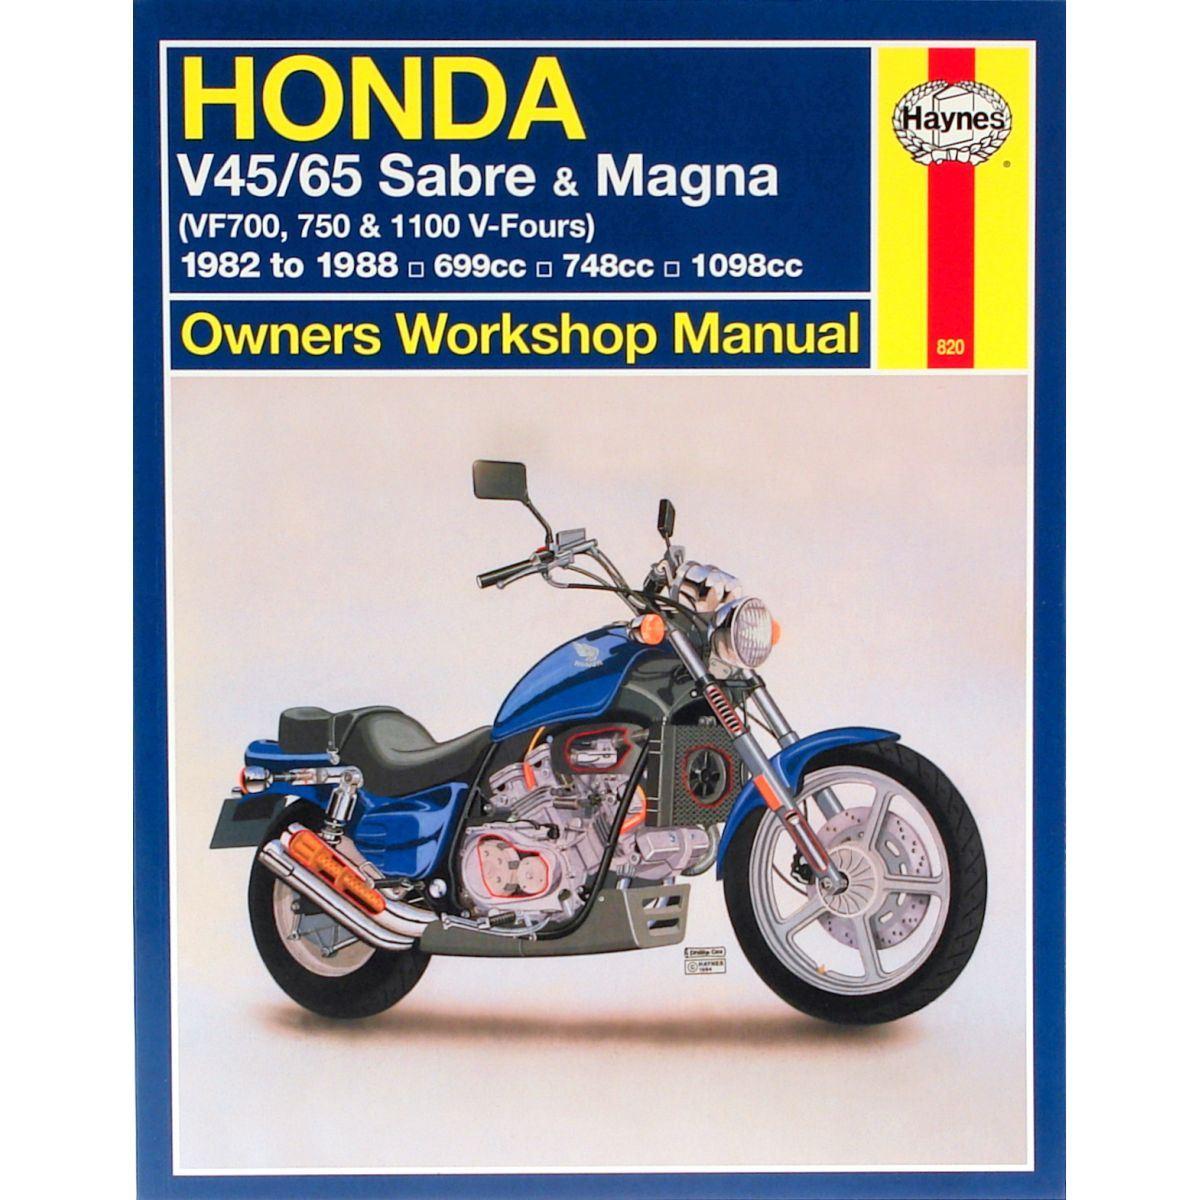 Image Is Loading Manual Haynes For 1984 Honda VF 1100 CE